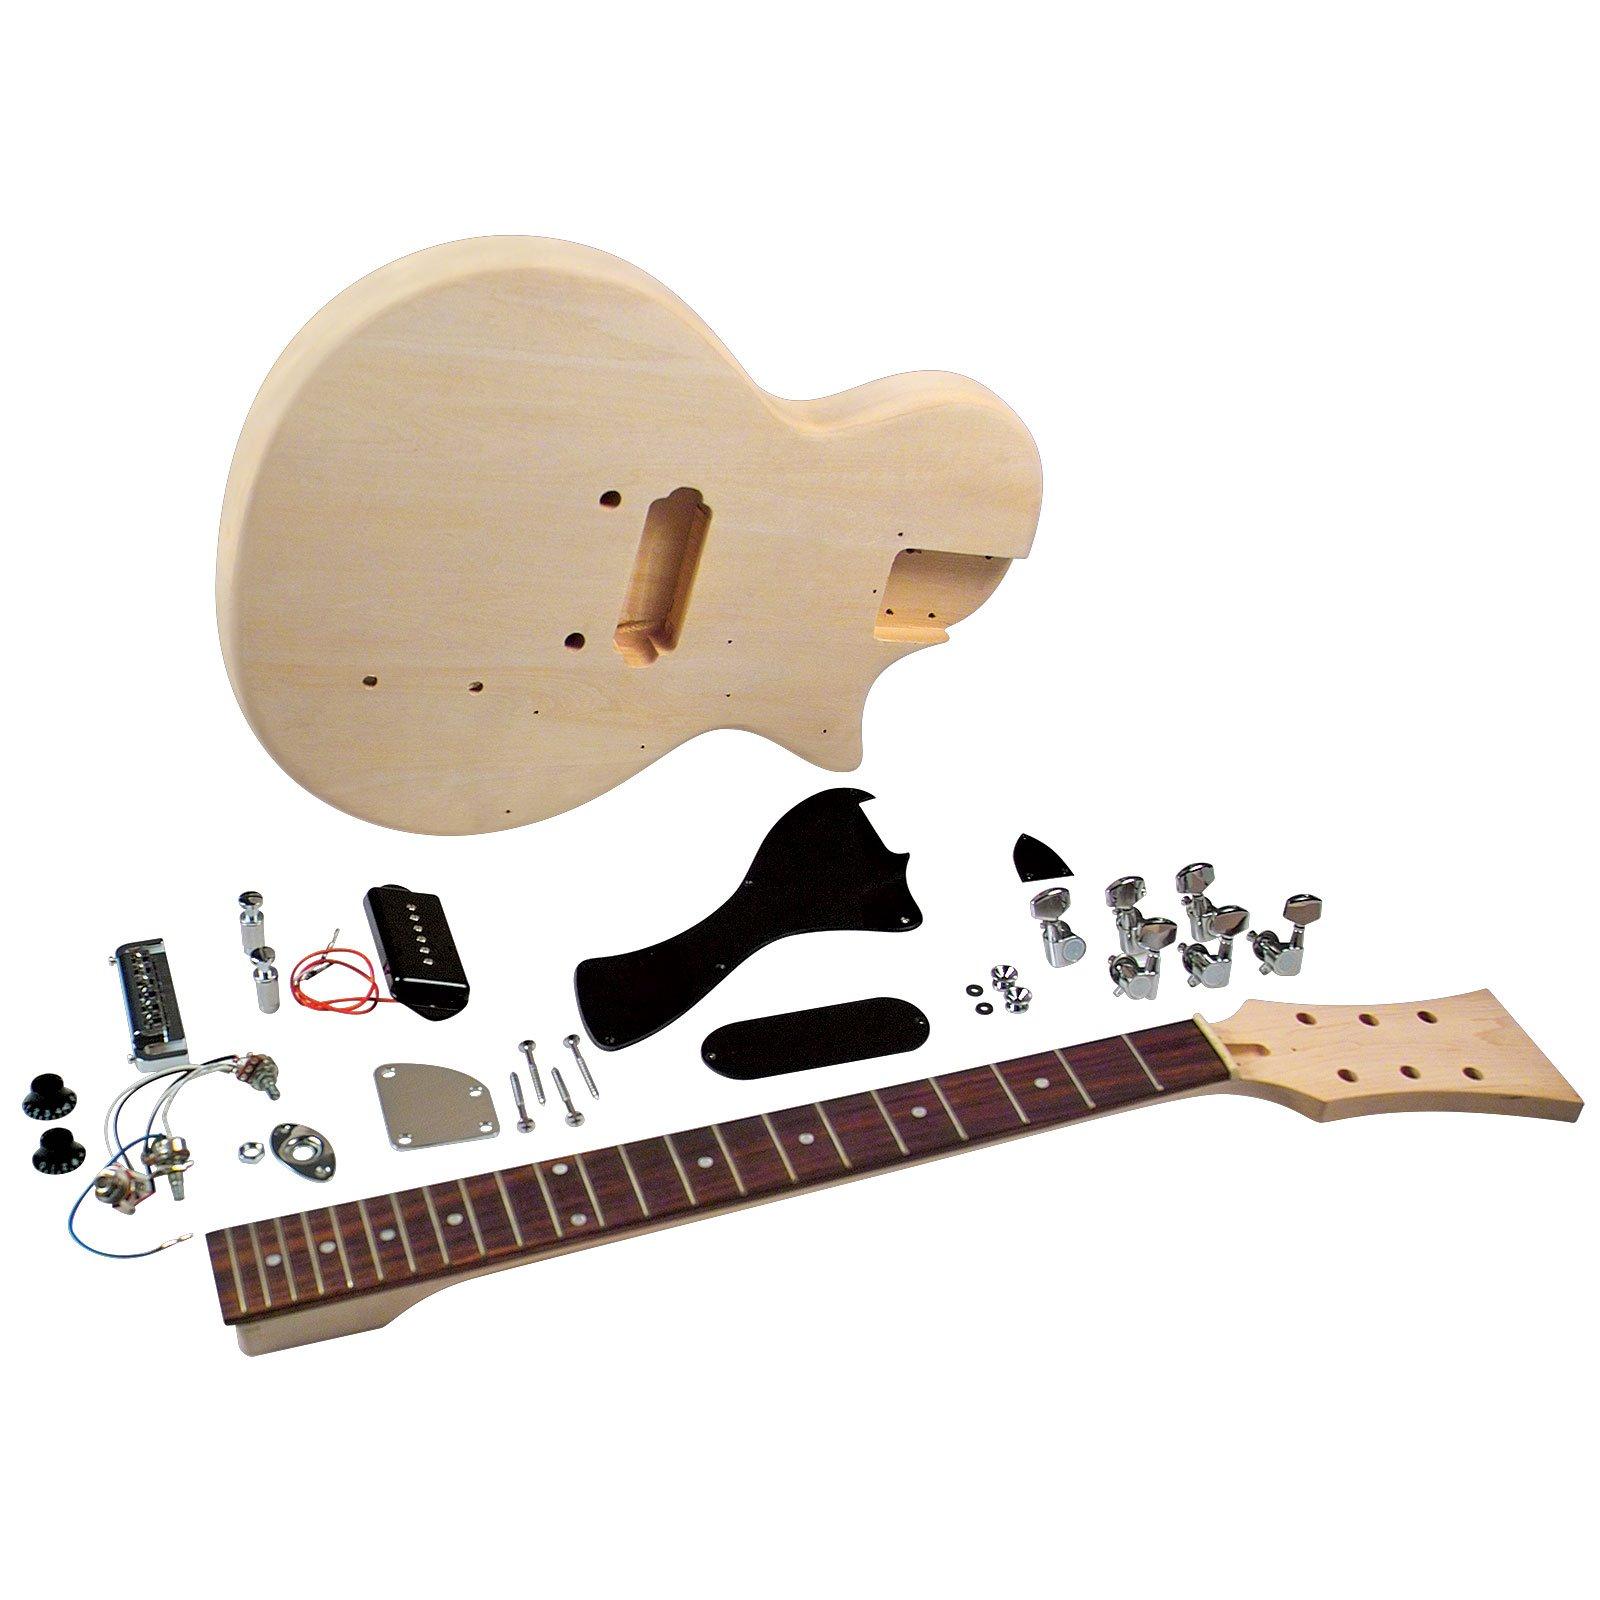 Cheap Saga LJ-10 Student Electric Guitar Kit - Single Cutaway Black Friday & Cyber Monday 2019